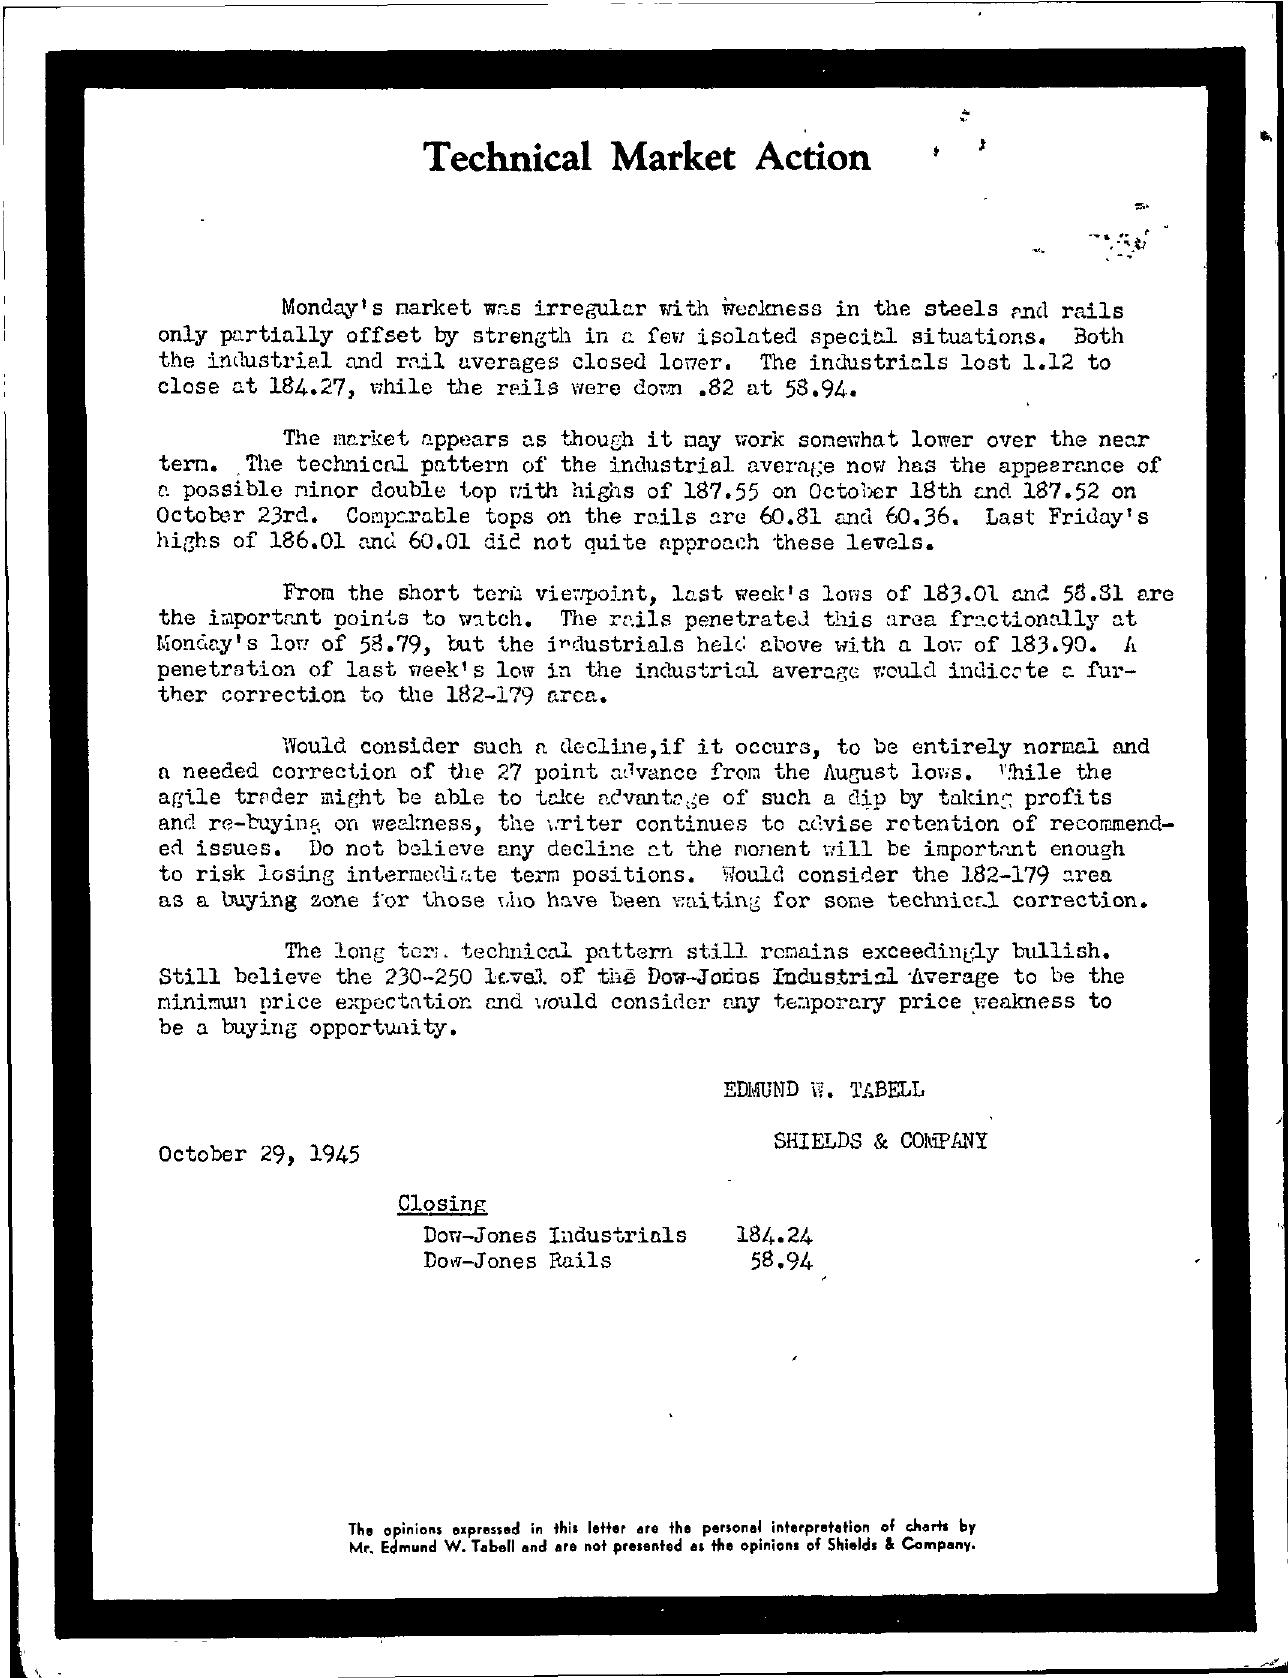 Tabell's Market Letter - October 29, 1945